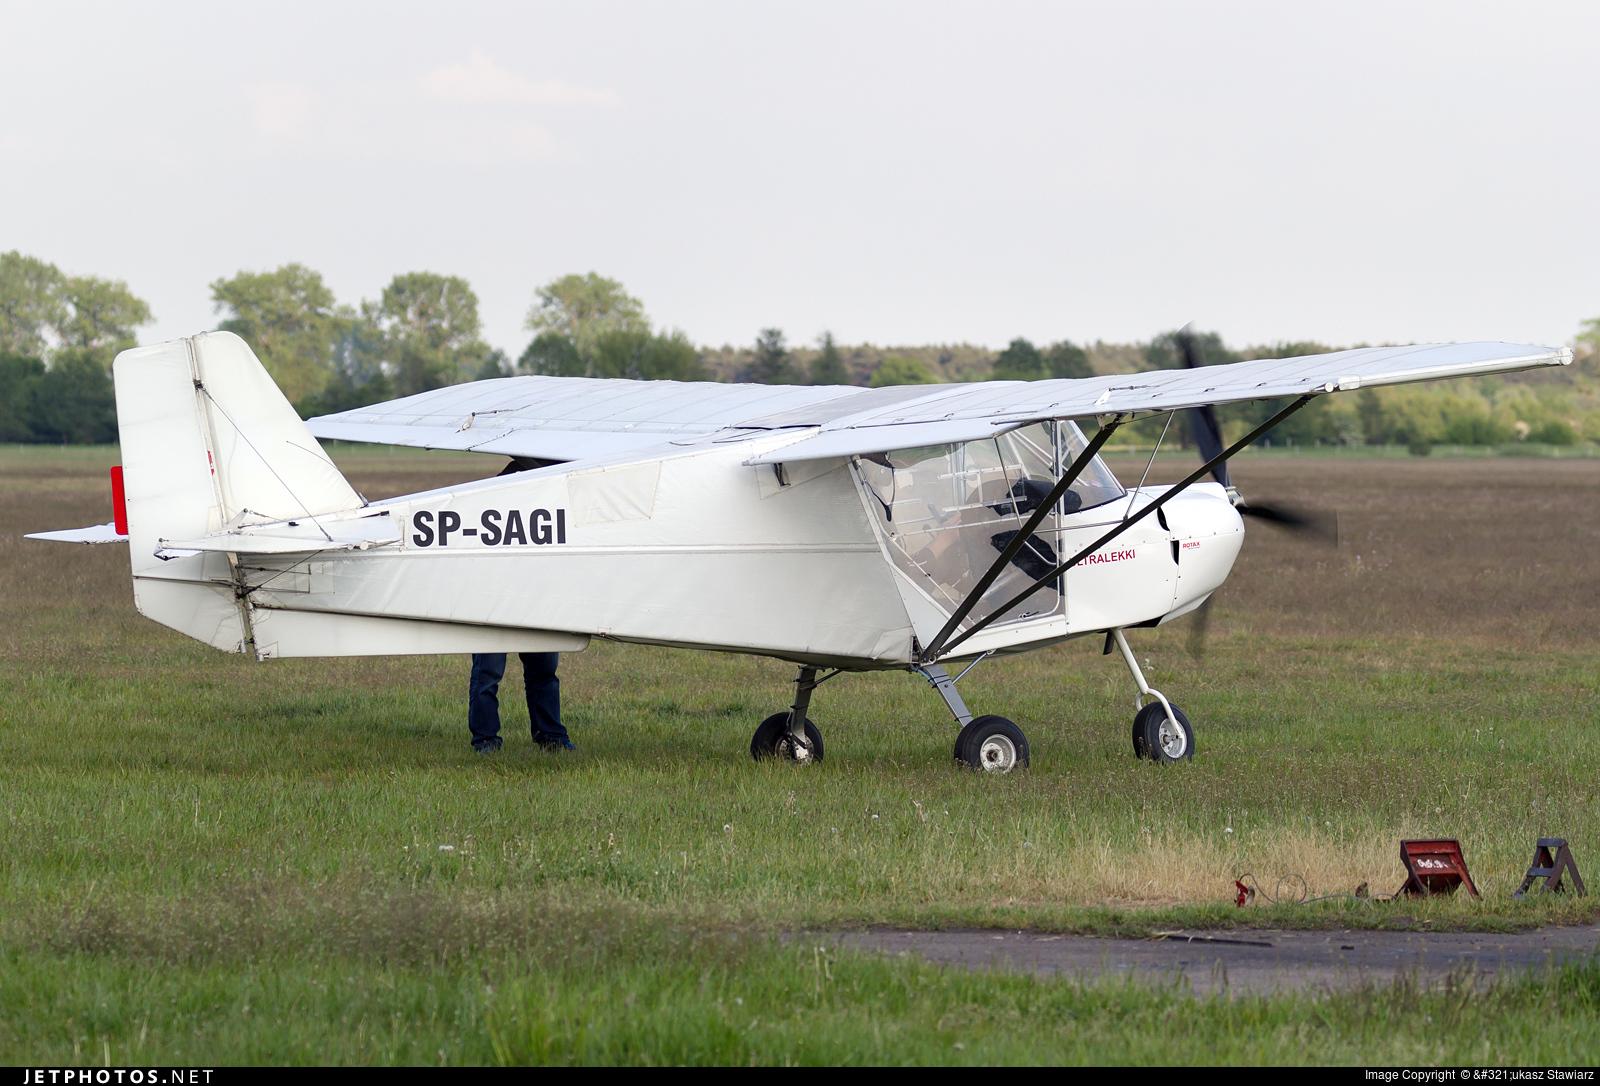 SP-SAGI - Skyranger 912 - Private